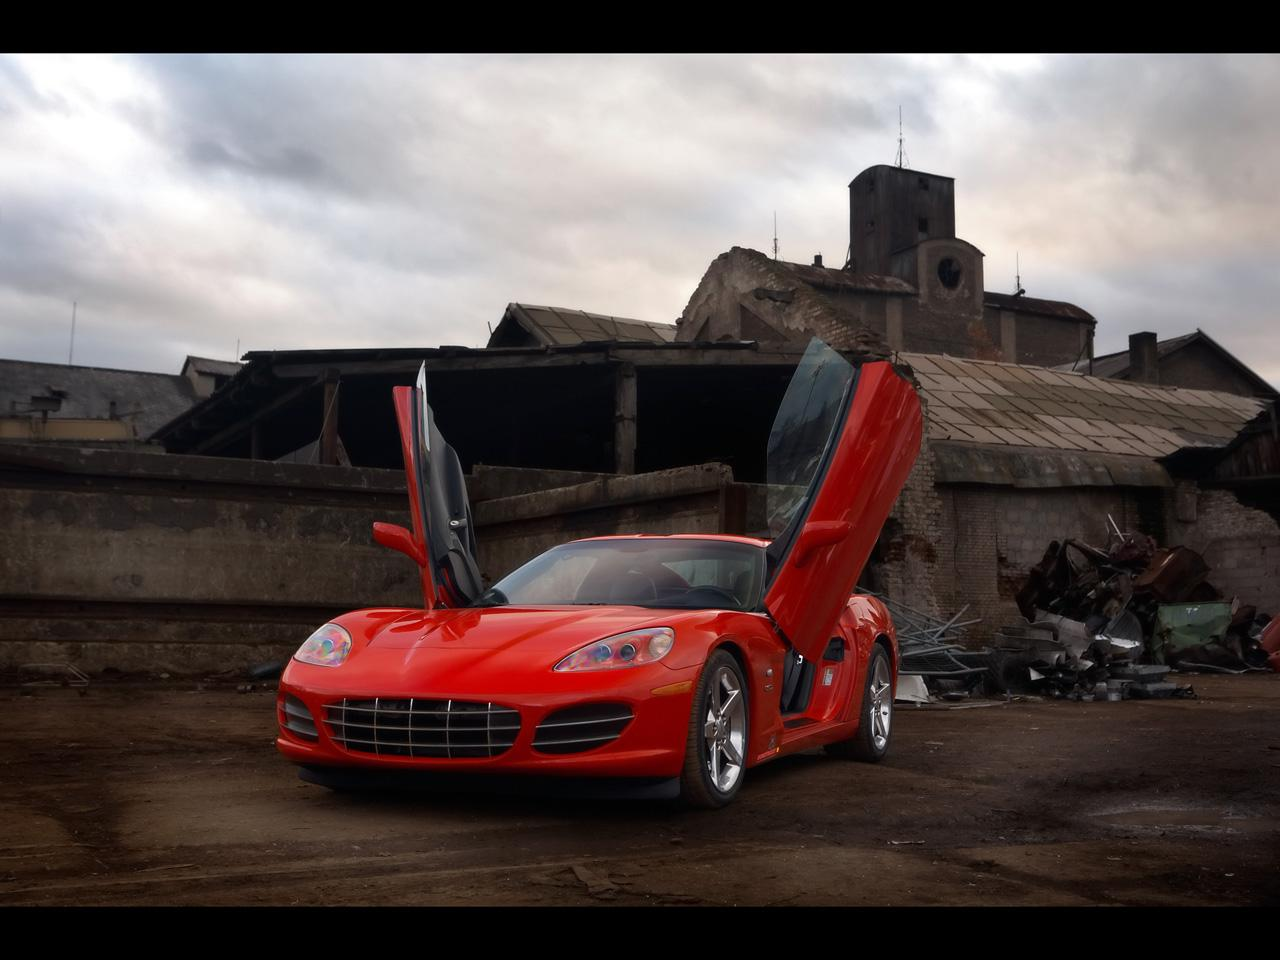 2009 Innotech Corvette C6 Wallpapers By Cars Wallpapers Net